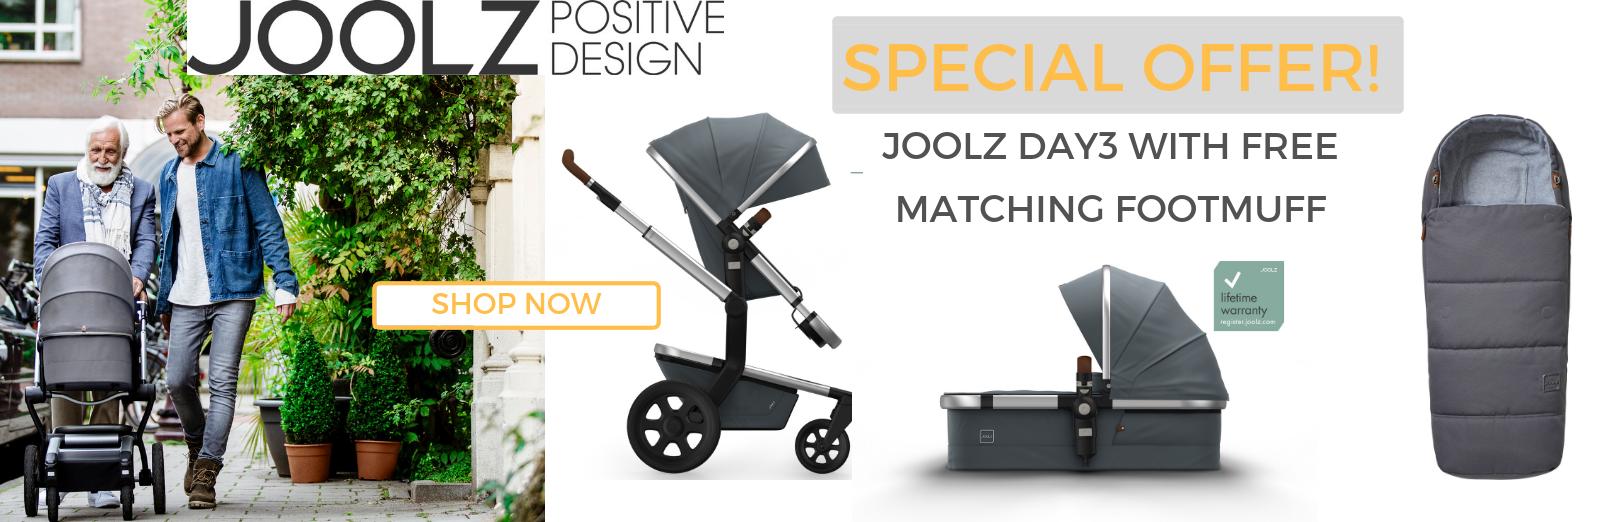 Joolz Footmuff Promo